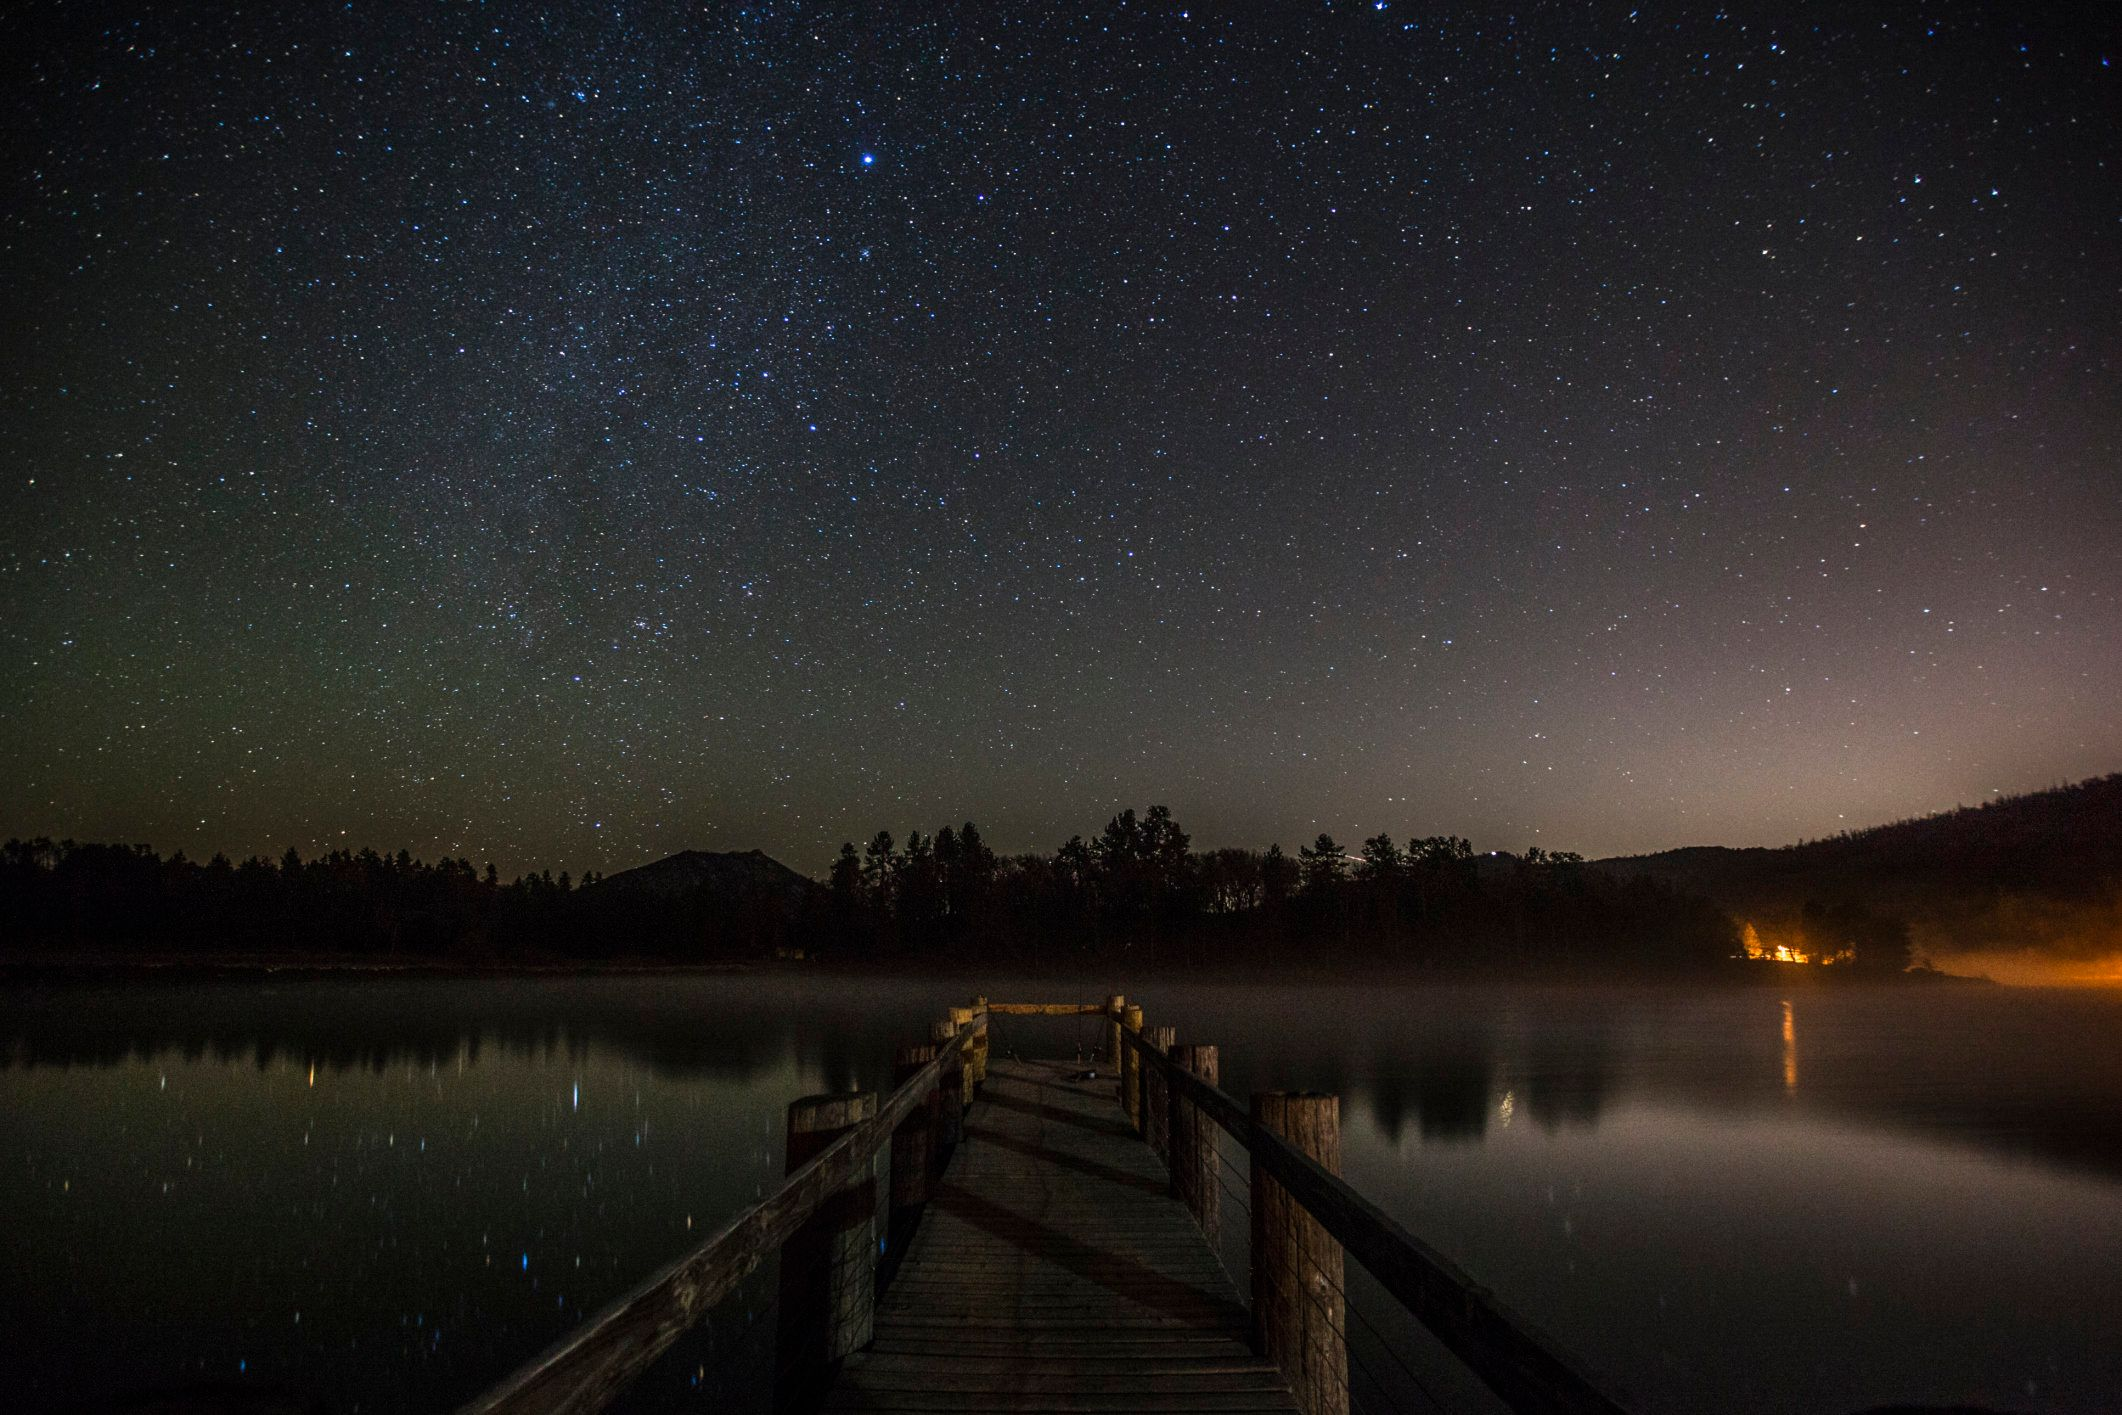 Milky Way galaxy over Lake Cuyamaca, California, USA